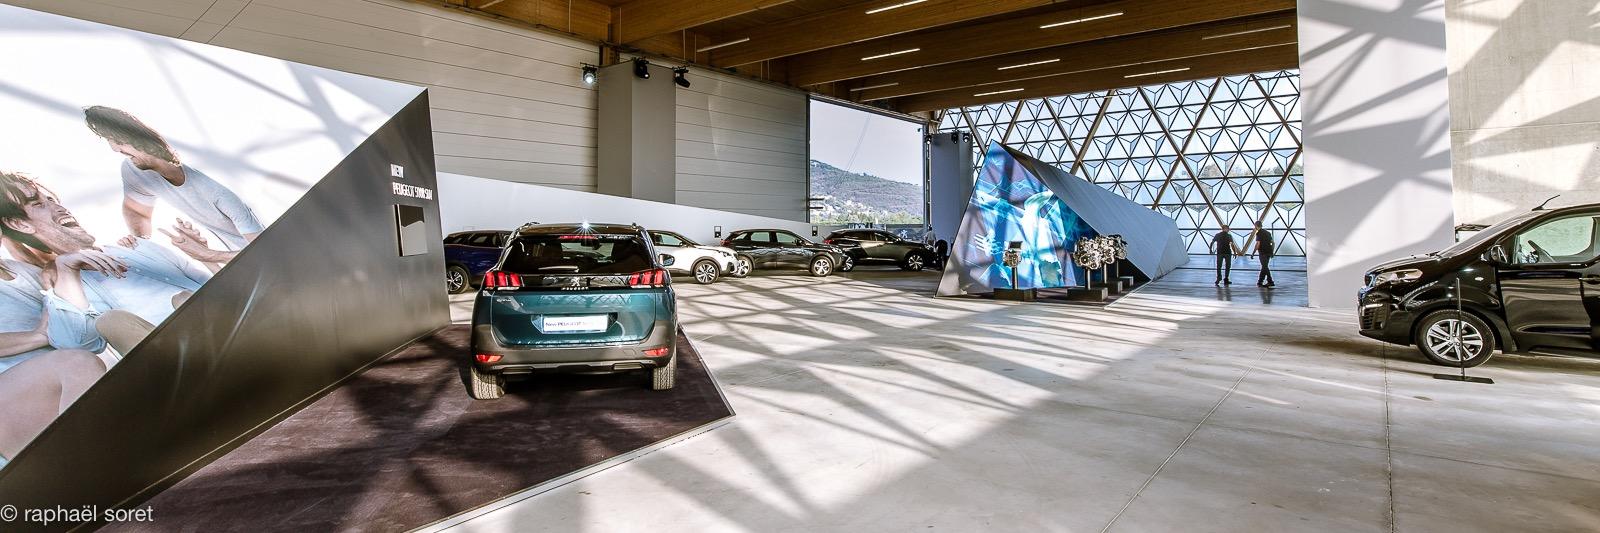 Peugeot Convention 2016 - Cannes